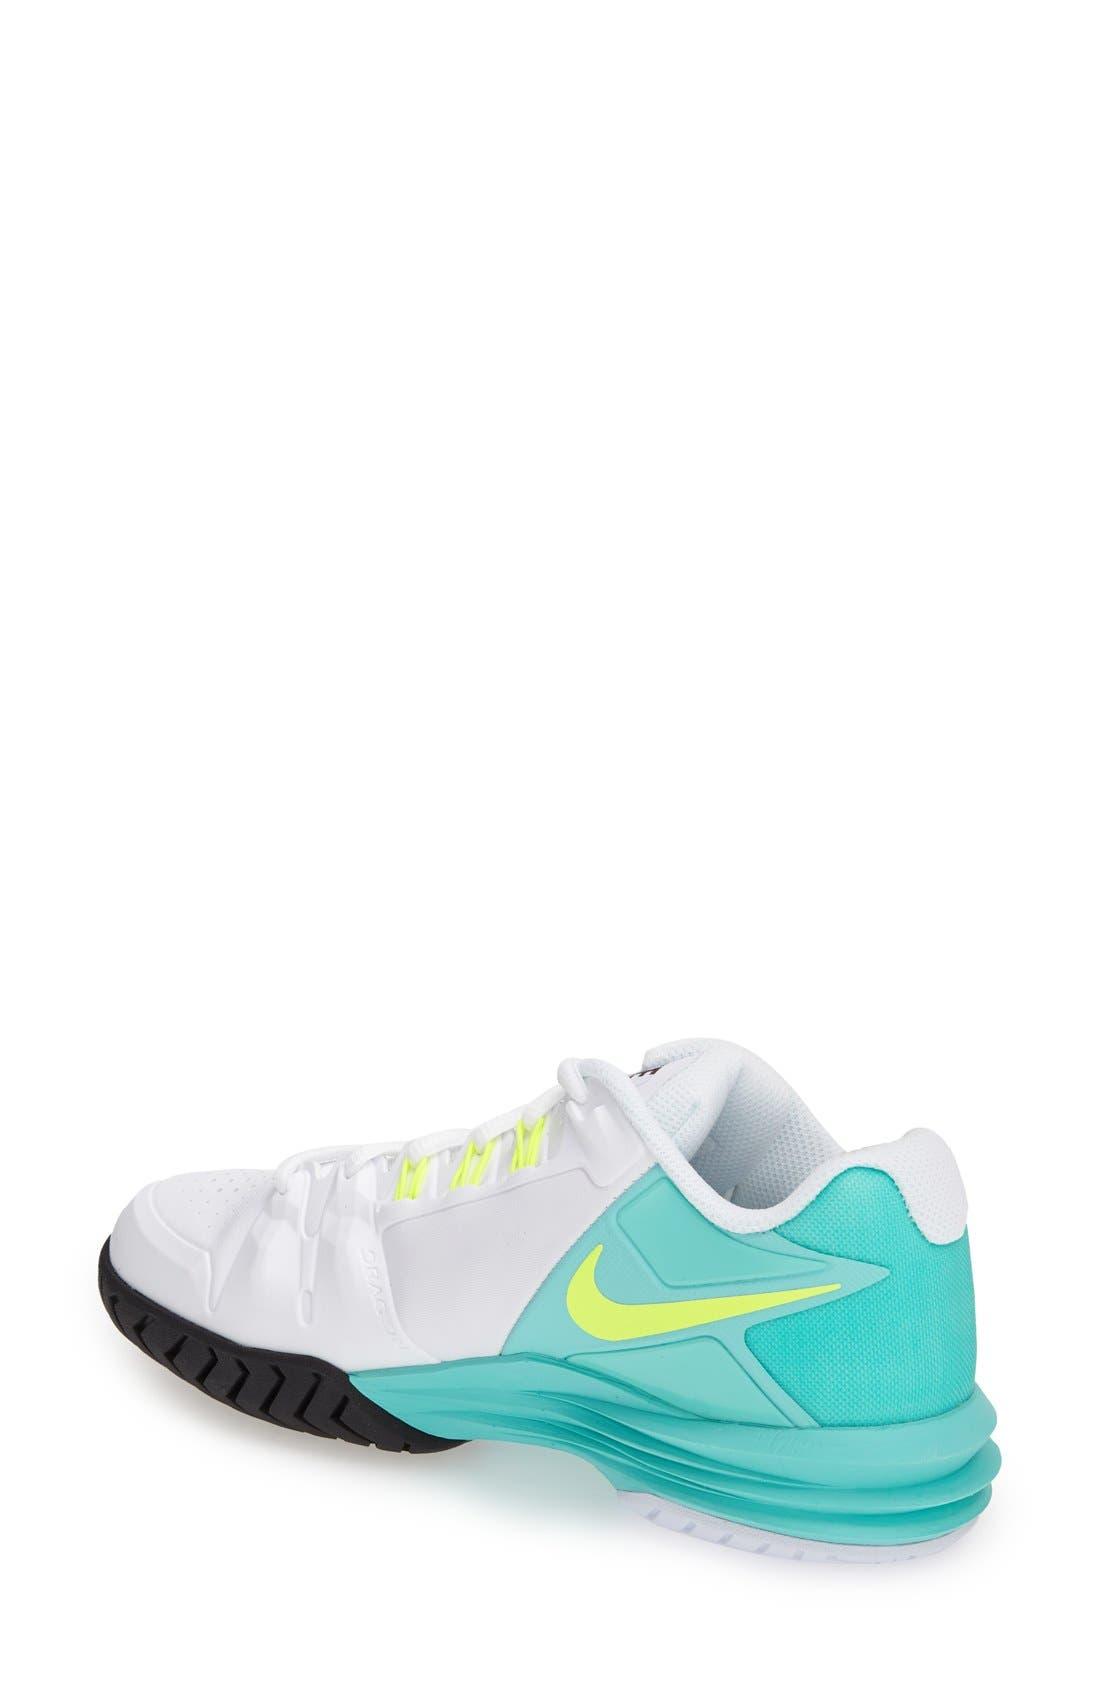 Alternate Image 2  - Nike 'Lunar Ballistec' Tennis Shoe (Women)